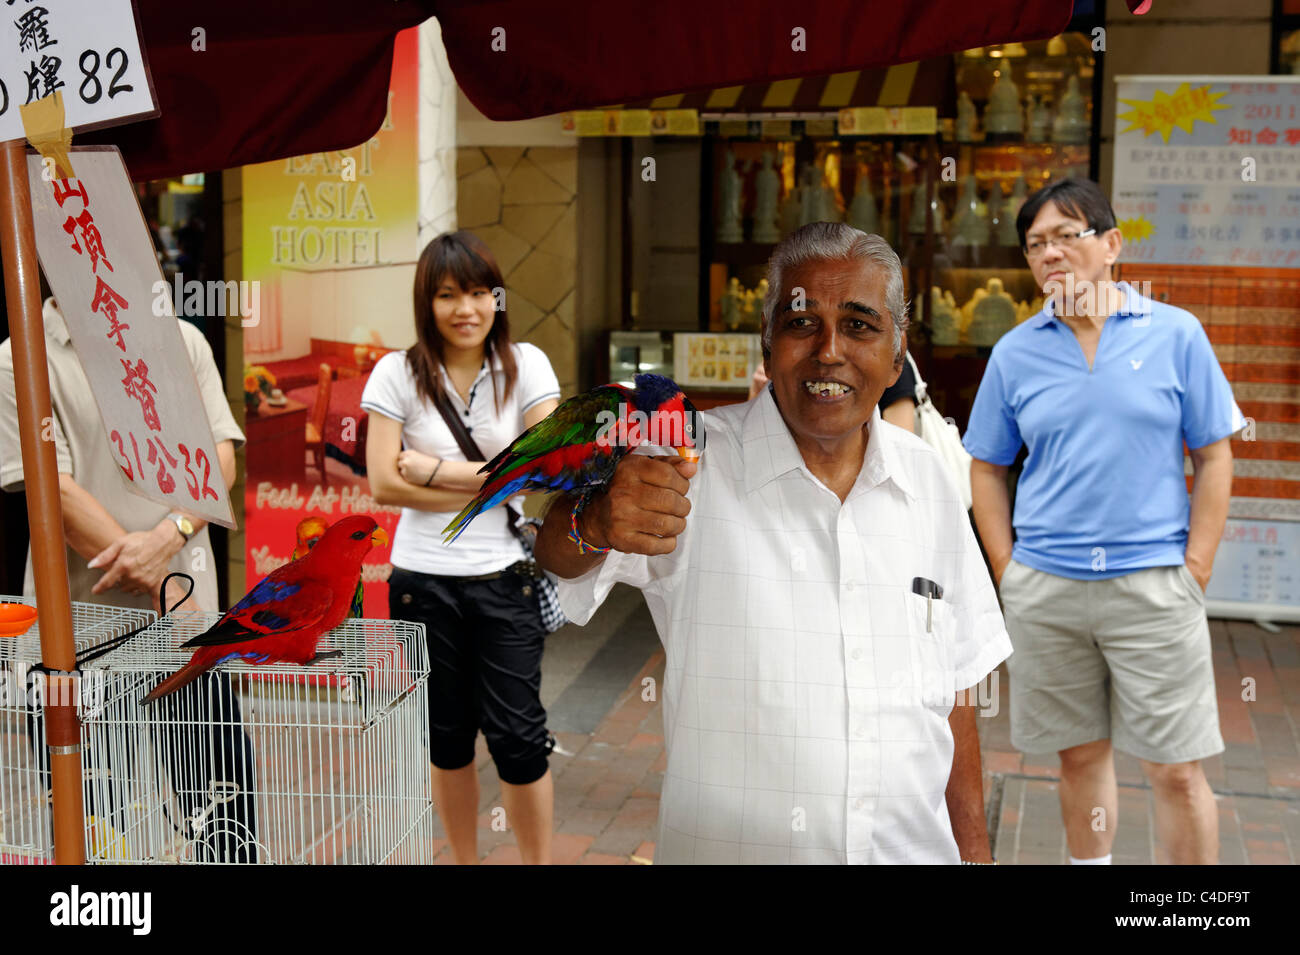 Exotic birds on sale in Bugis area of Singapore Stock Photo